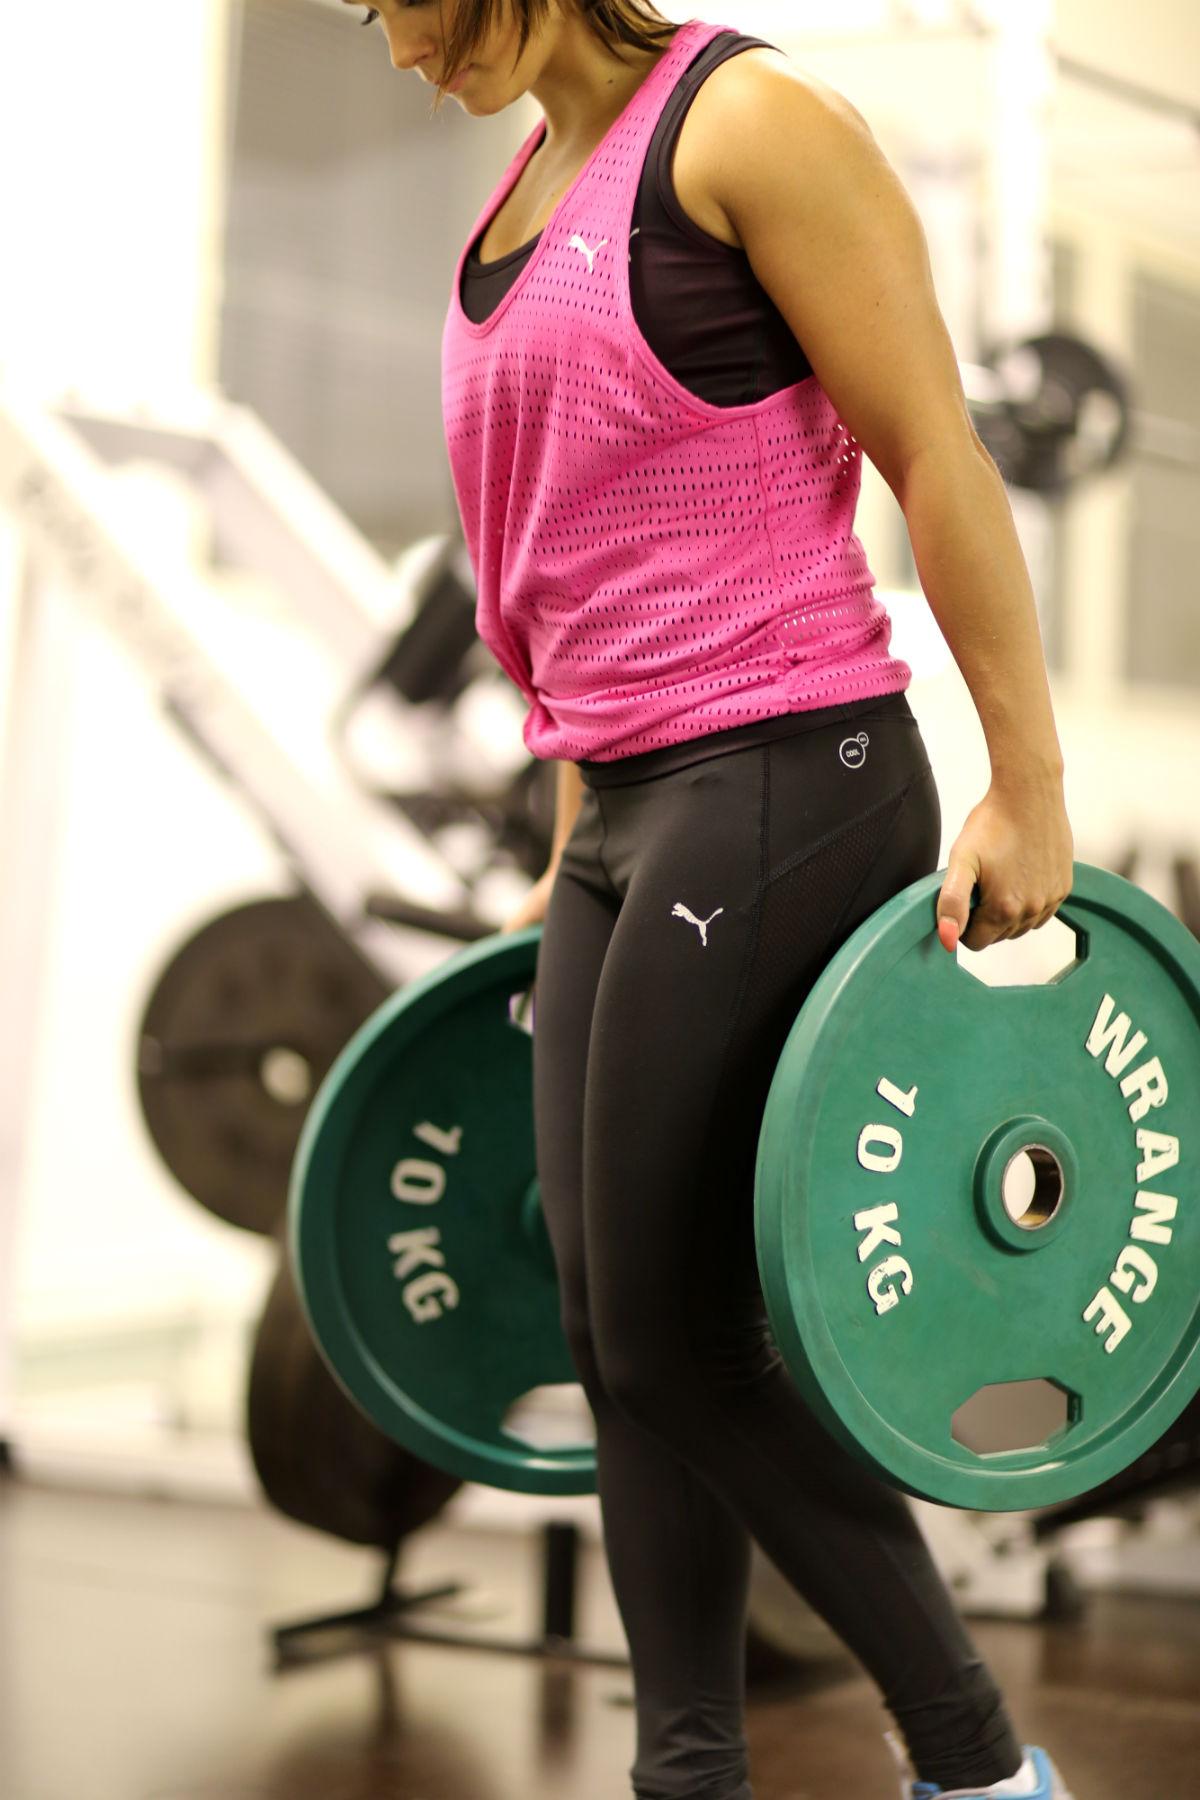 Minifitness_puma_trainingclothes_gym